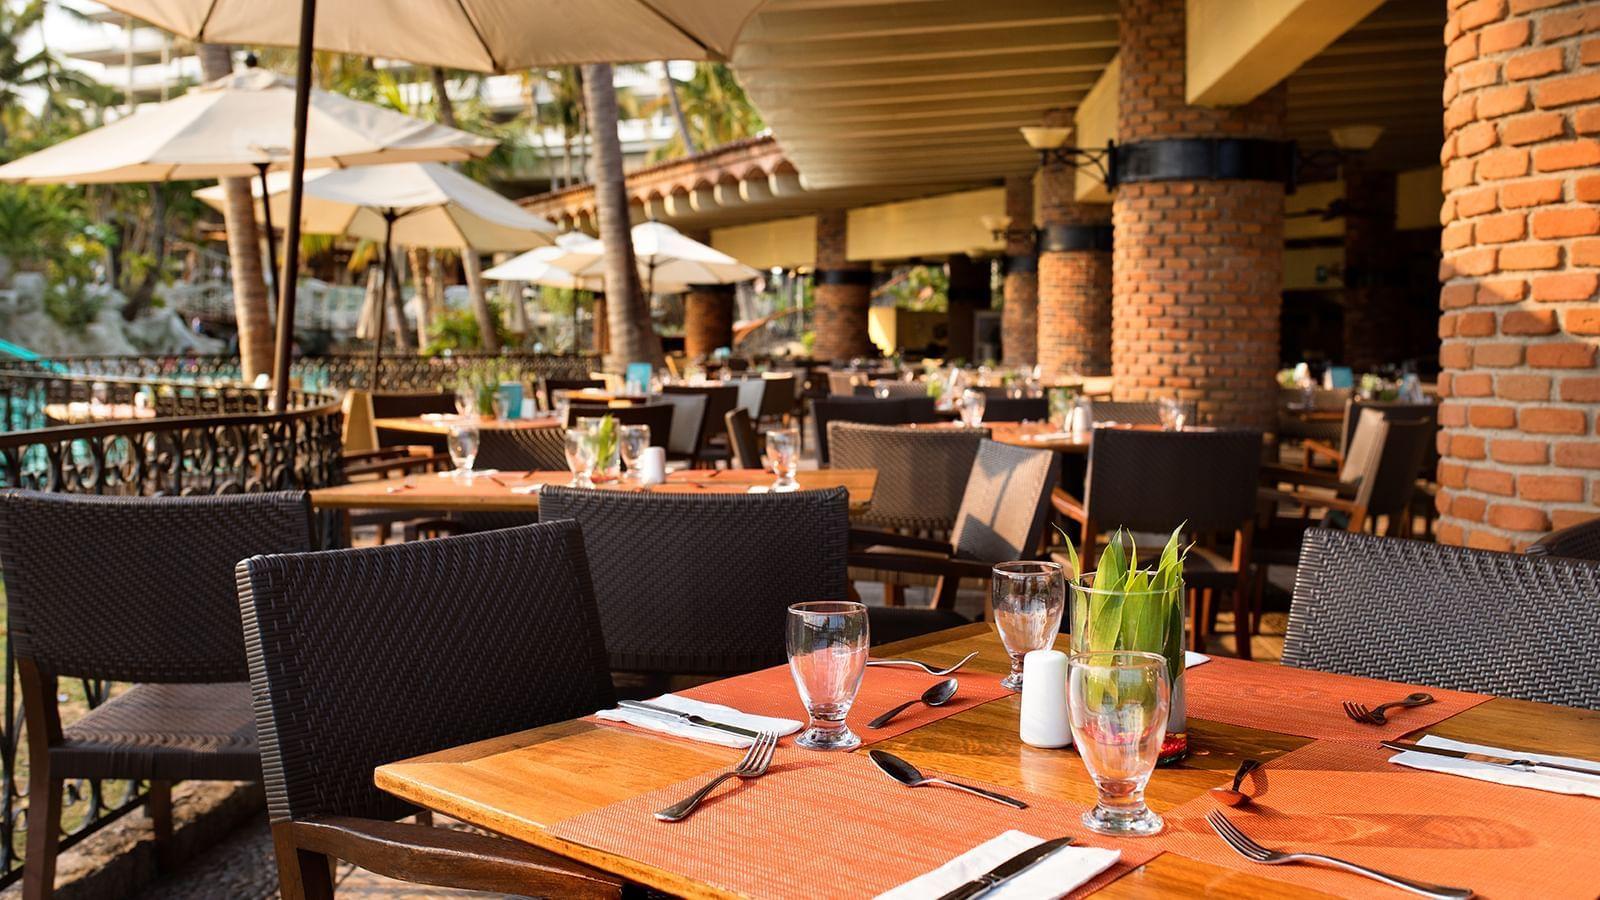 Dining area at Chula Vista Restaurant in Princess Mundo Imperial